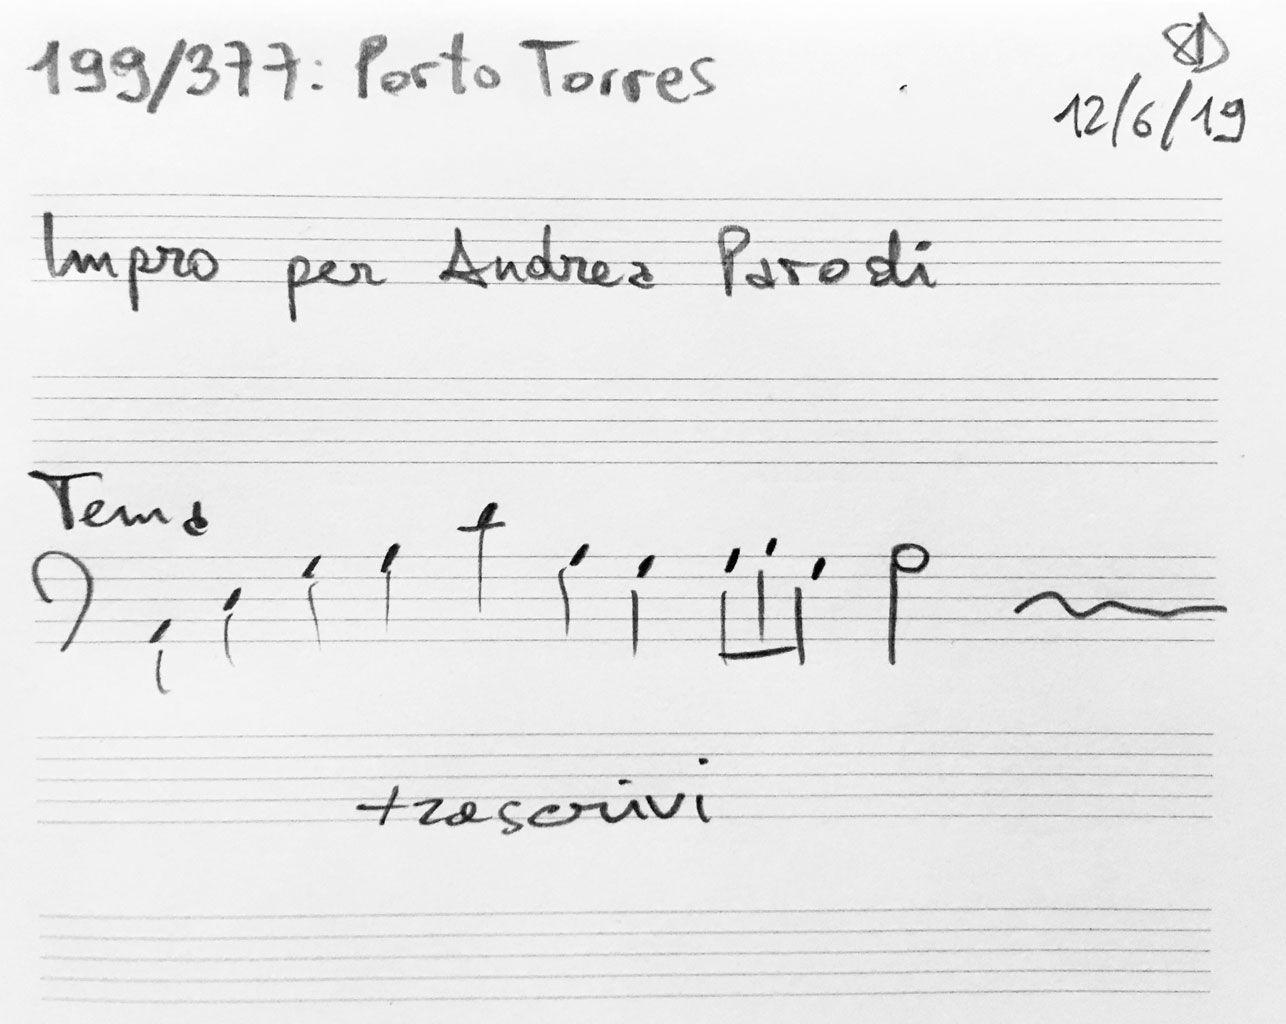 199-Porto-Torres-score